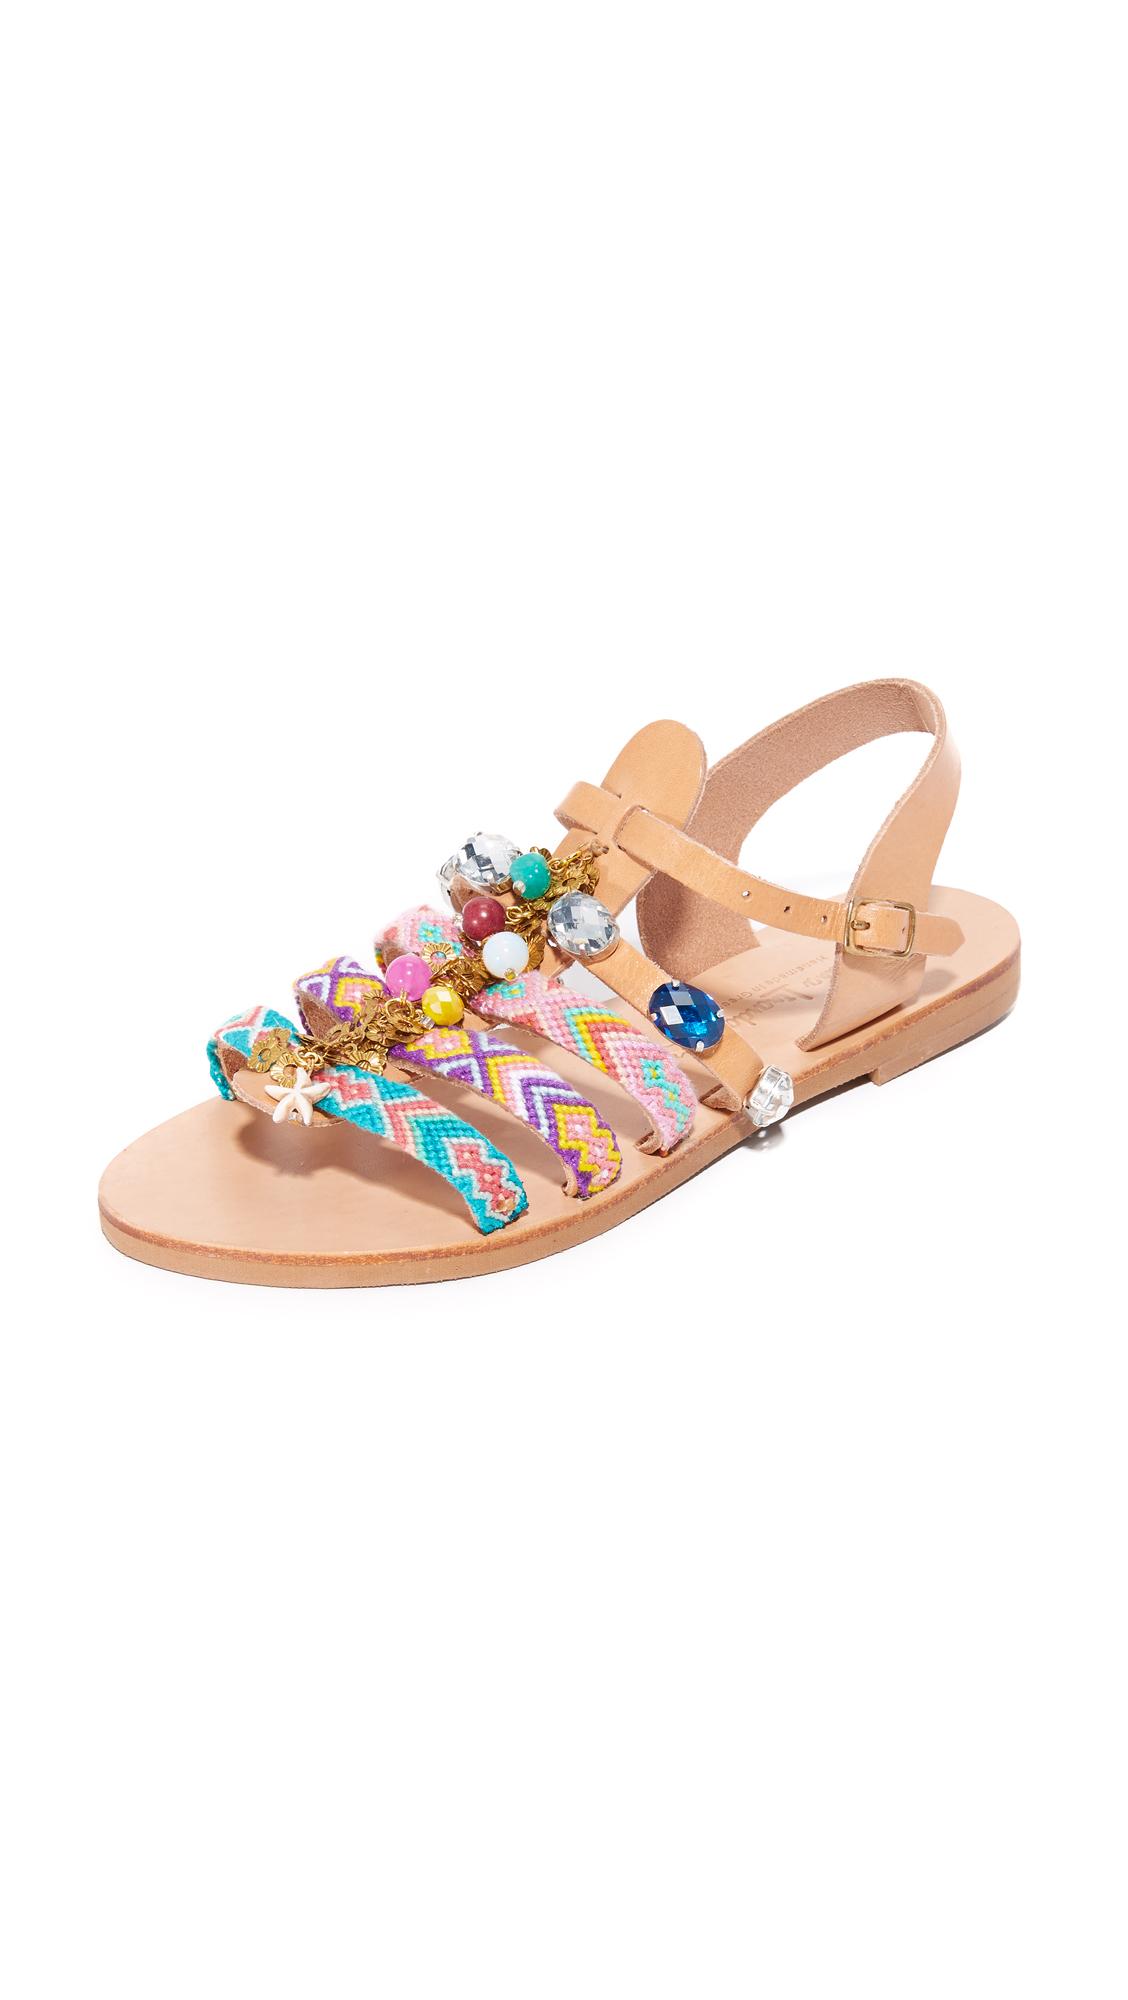 Elina Linardaki Astarte II Sandals - Multi